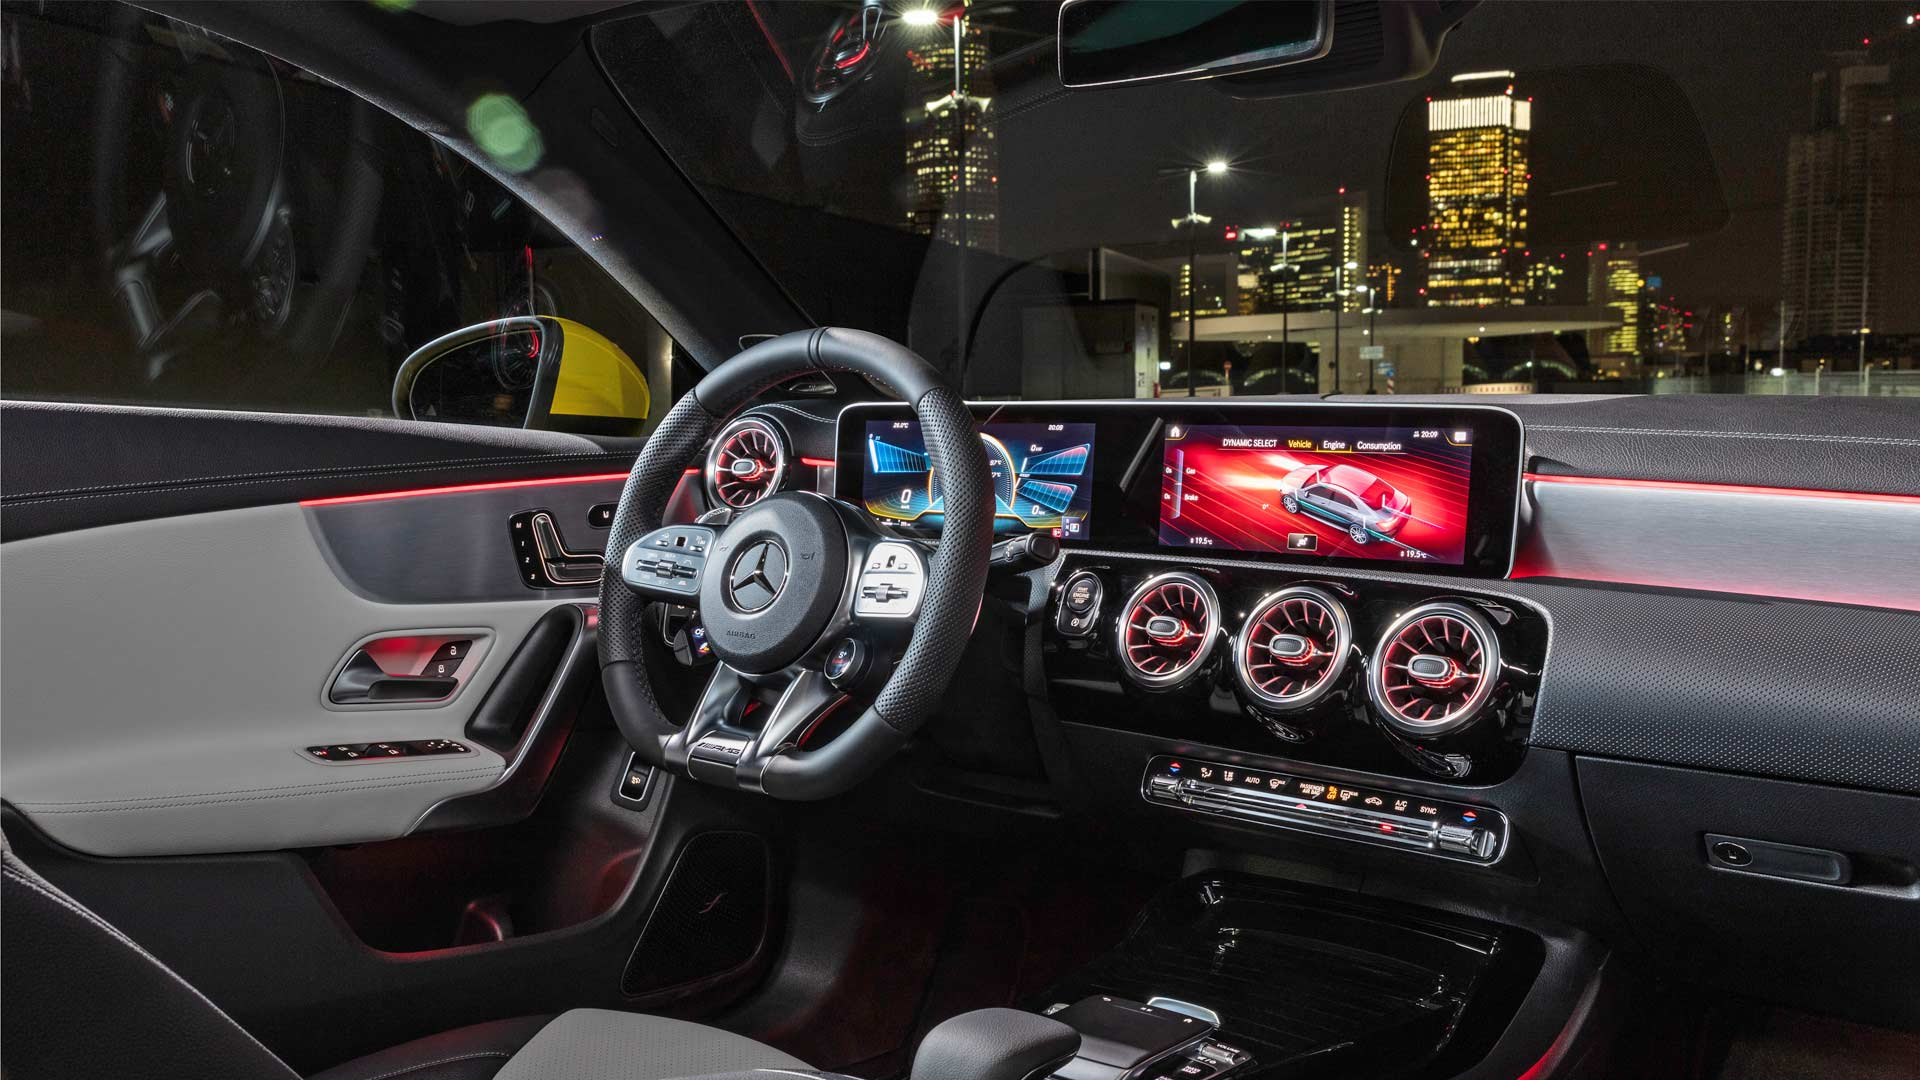 2020-Mercedes-AMG-CLA-35-4Matic-Interior_2